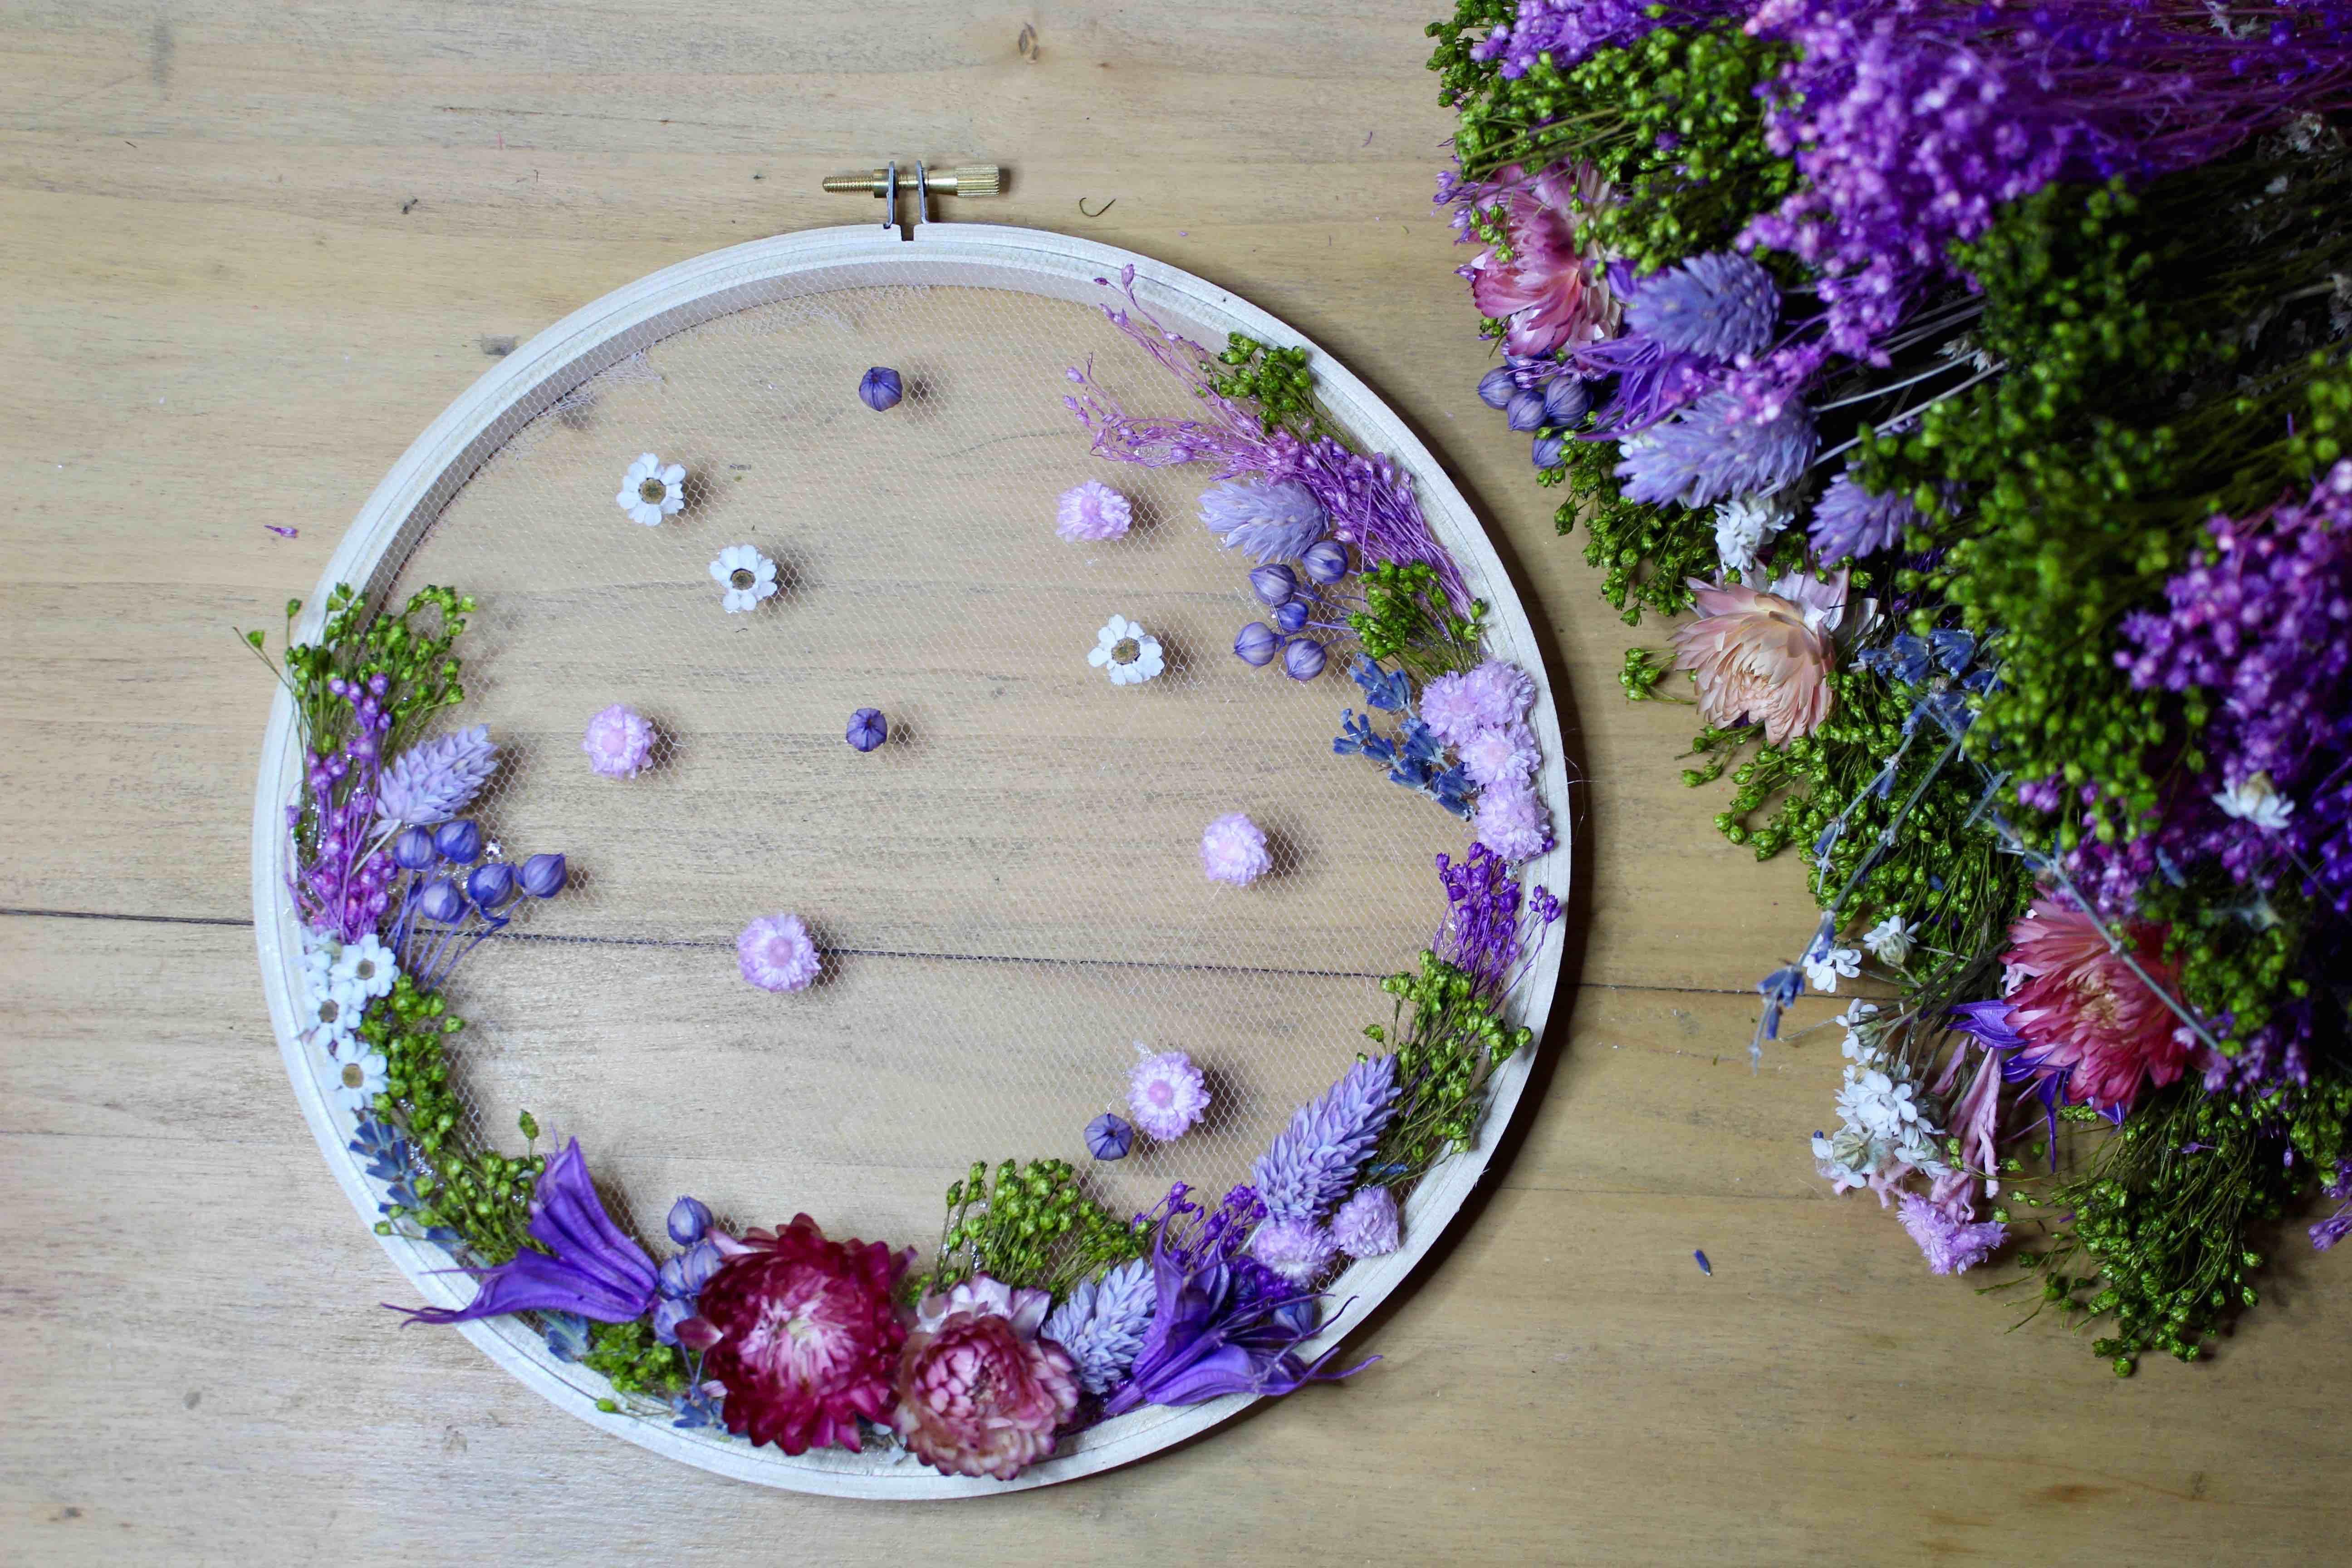 atelier DIY id creative Lyon Tambour de fleurs sechees